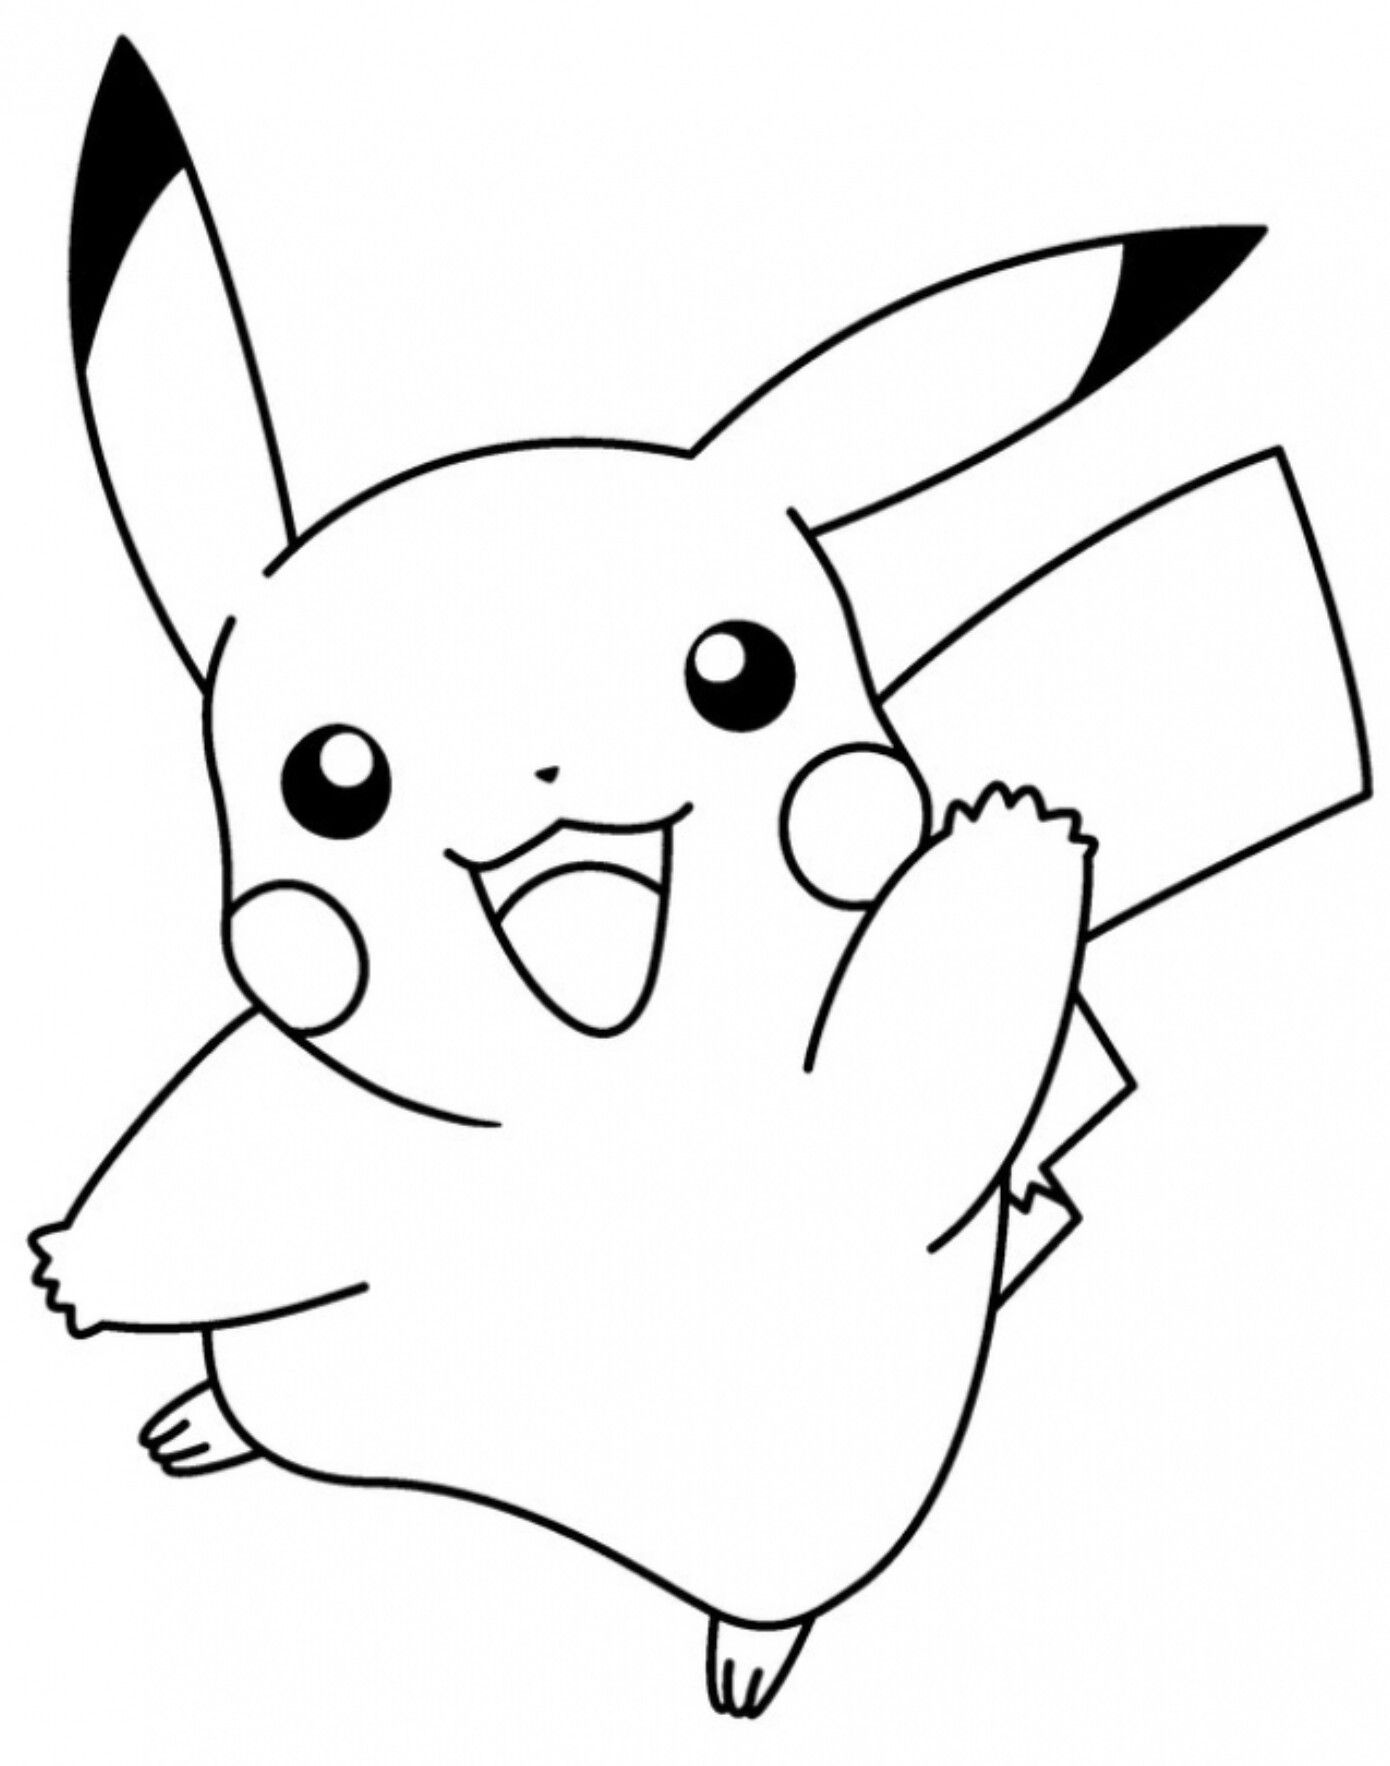 pinvanja radovic on bojanka  pokemon coloring pages